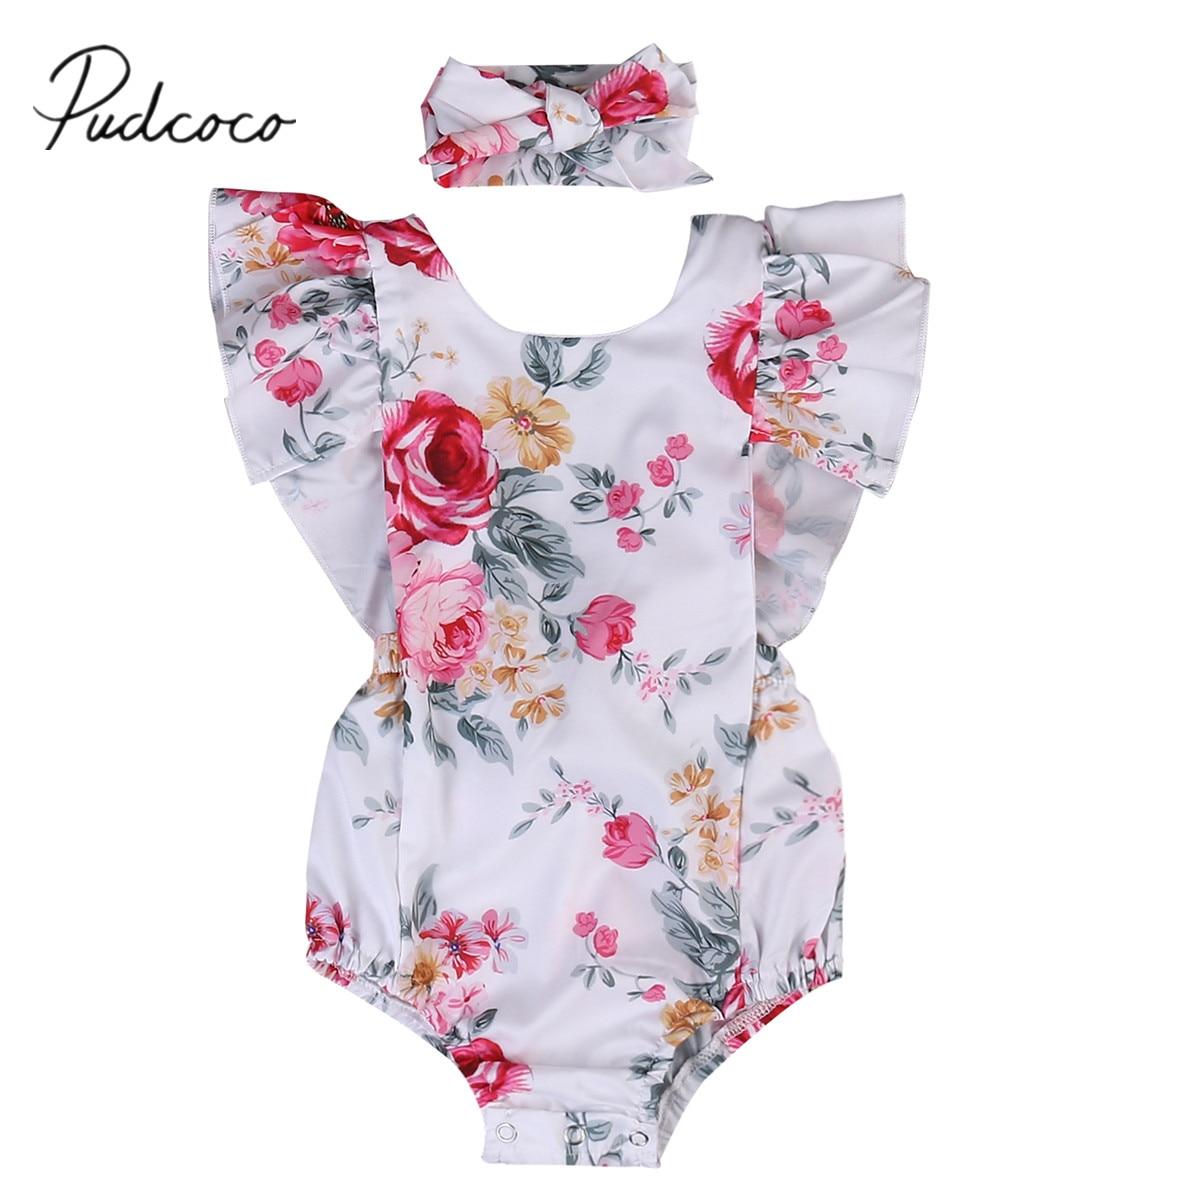 Magic Cube Newborn Baby Short Sleeve Romper Infant Summer Clothing